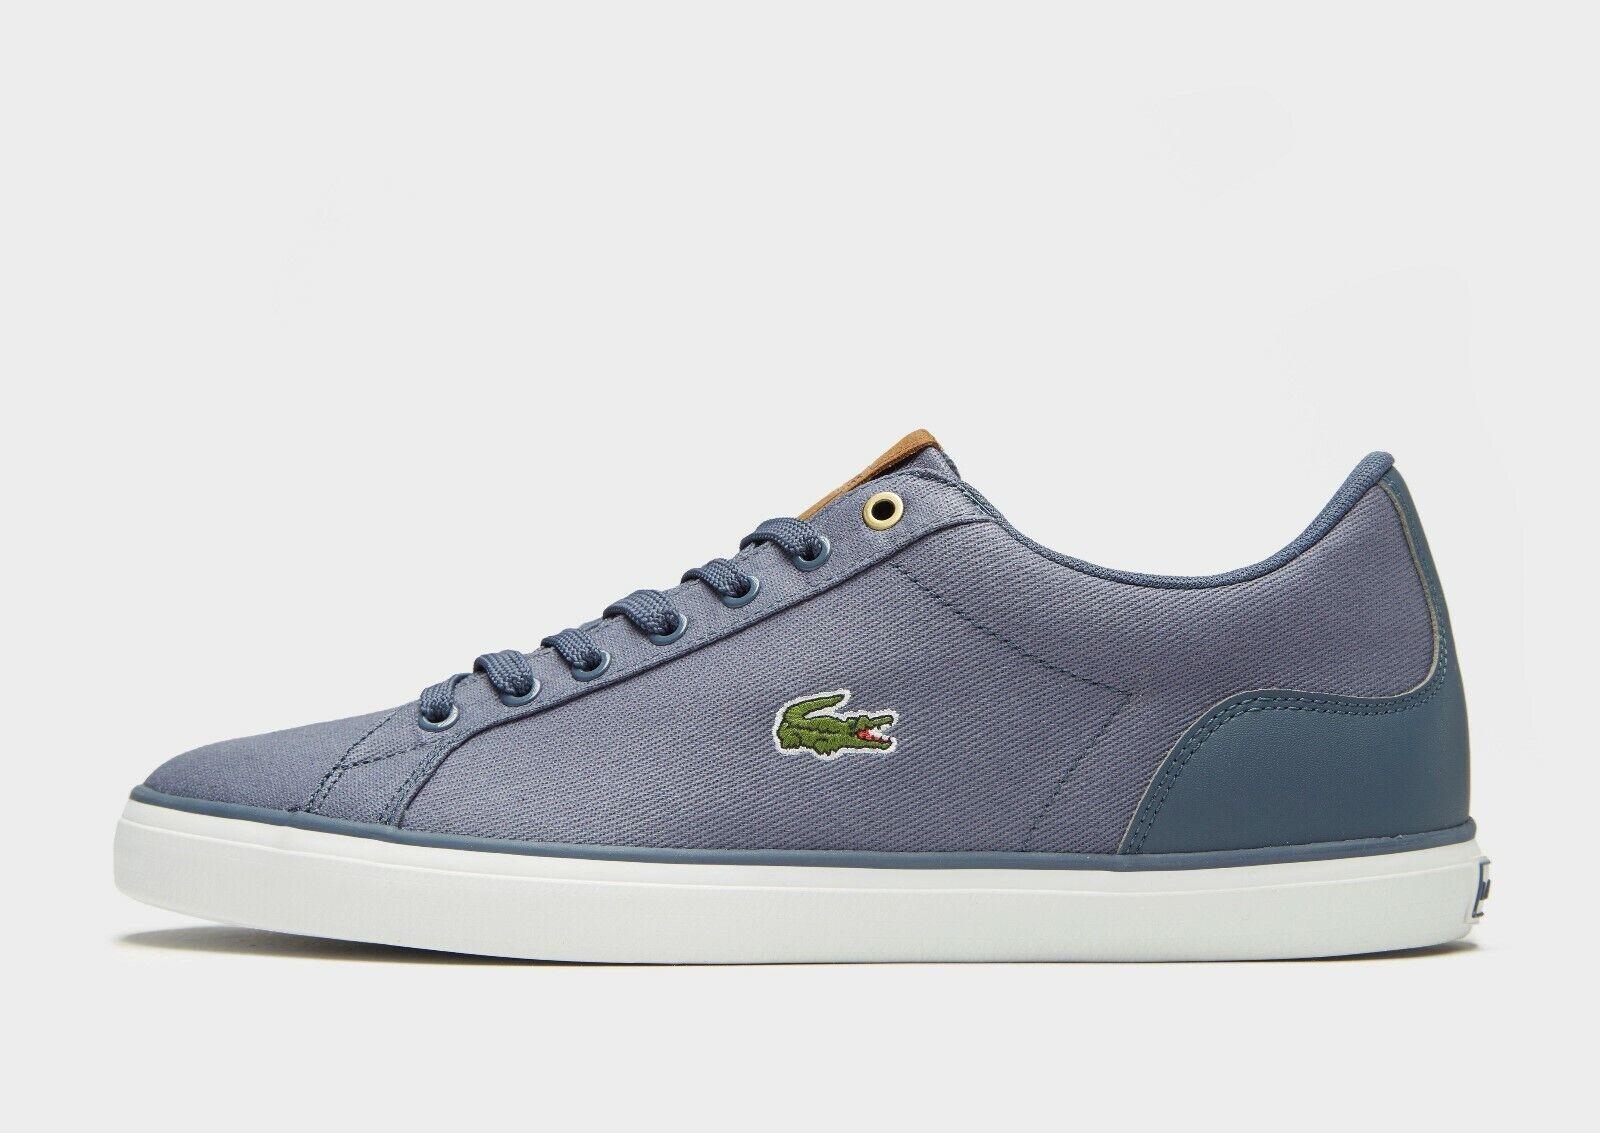 Latest -LACOSTE LEROND -Men Trainer (UK 8.5 & 9 & 9.5) Cam DK bluee Brand New